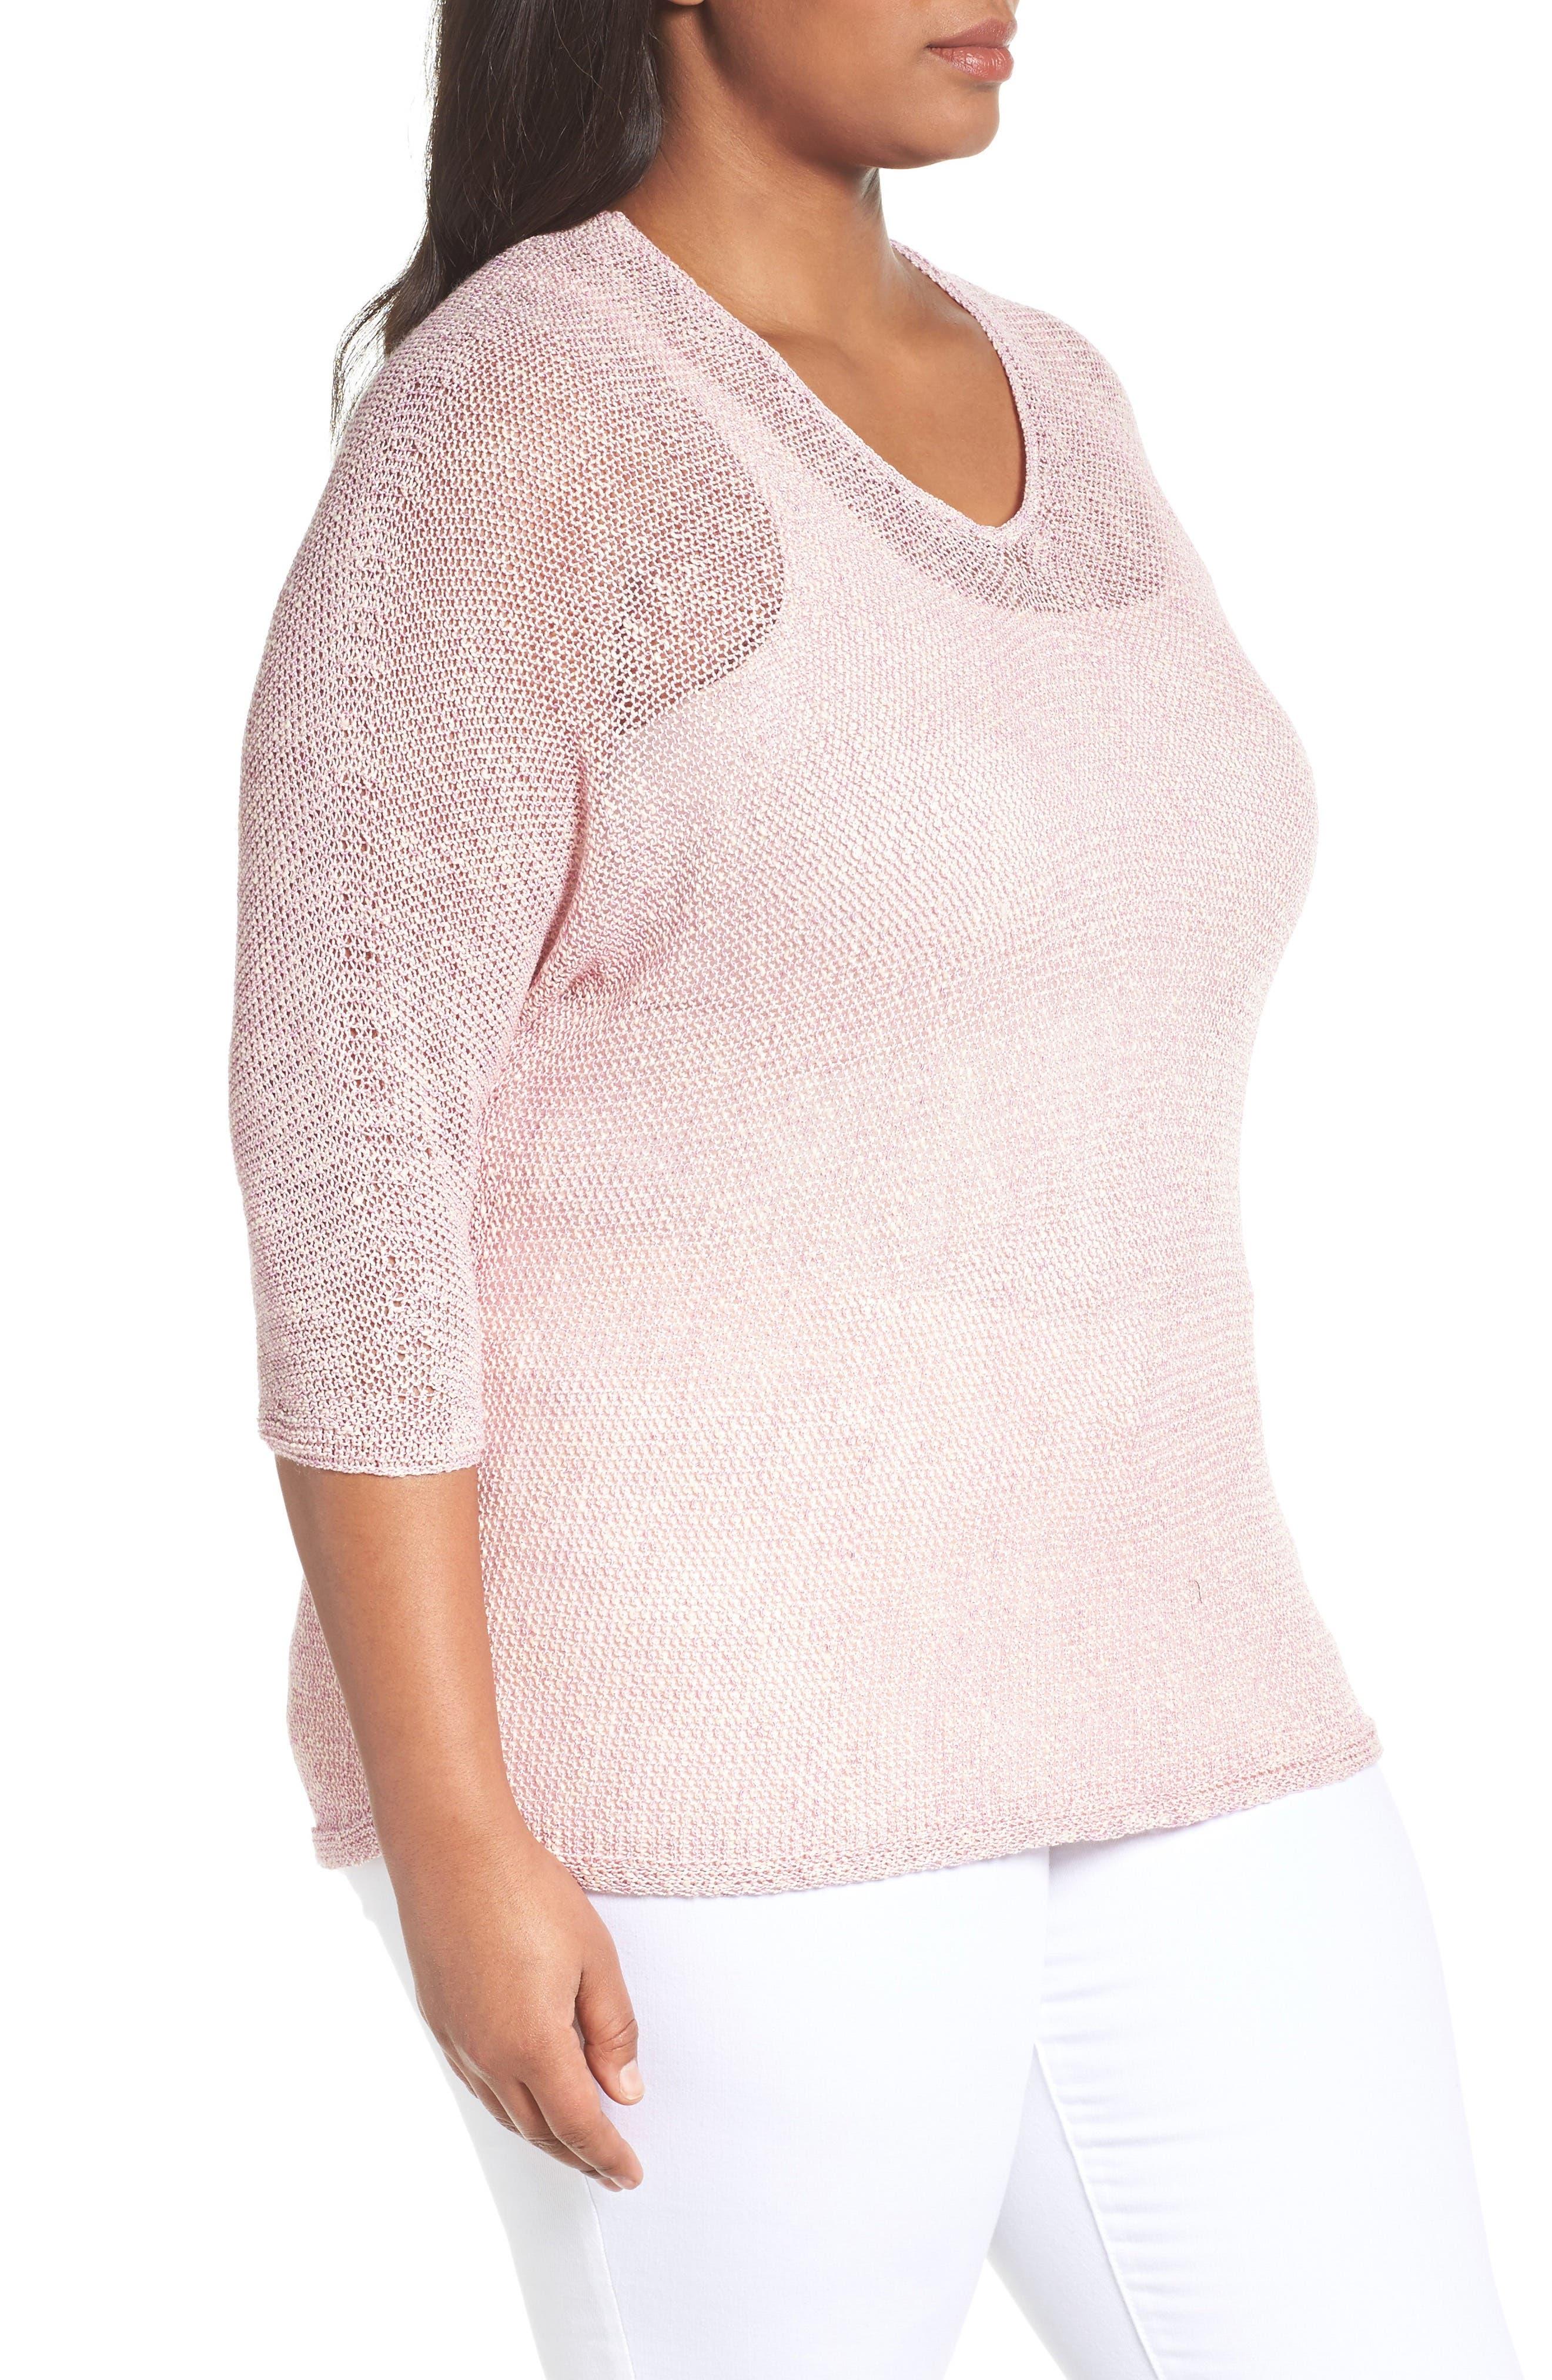 NIC+ZOE,                             Sunkissed Sheer Linen Blend Pullover,                             Alternate thumbnail 3, color,                             300